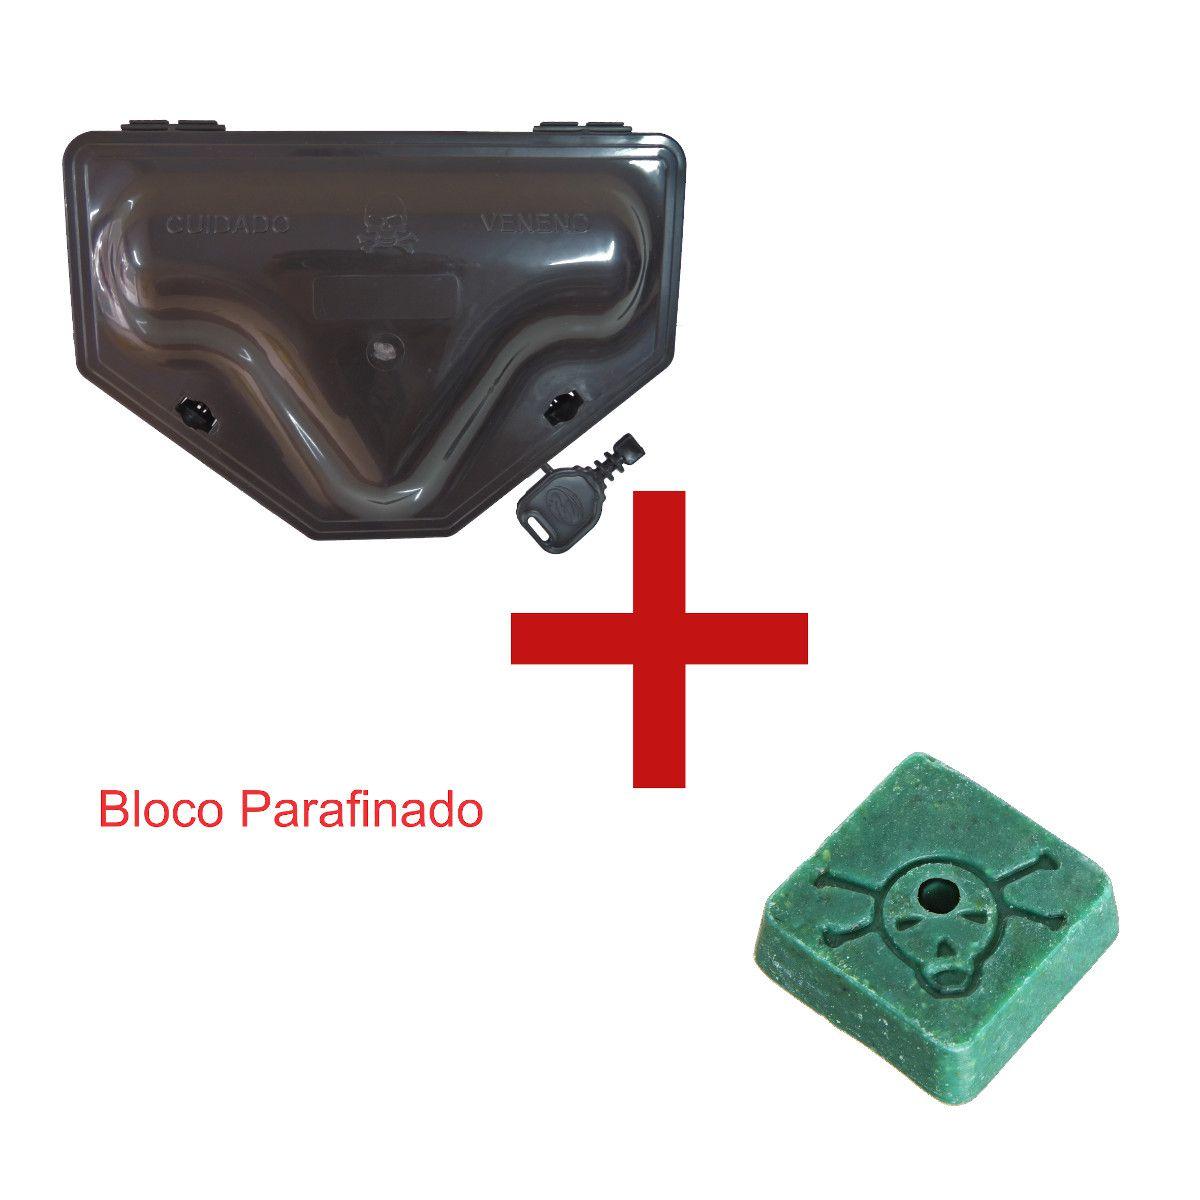 KIT 30 Porta Iscas Reforçado 2 TRAVAS Chave Ratoeira p/Ratos